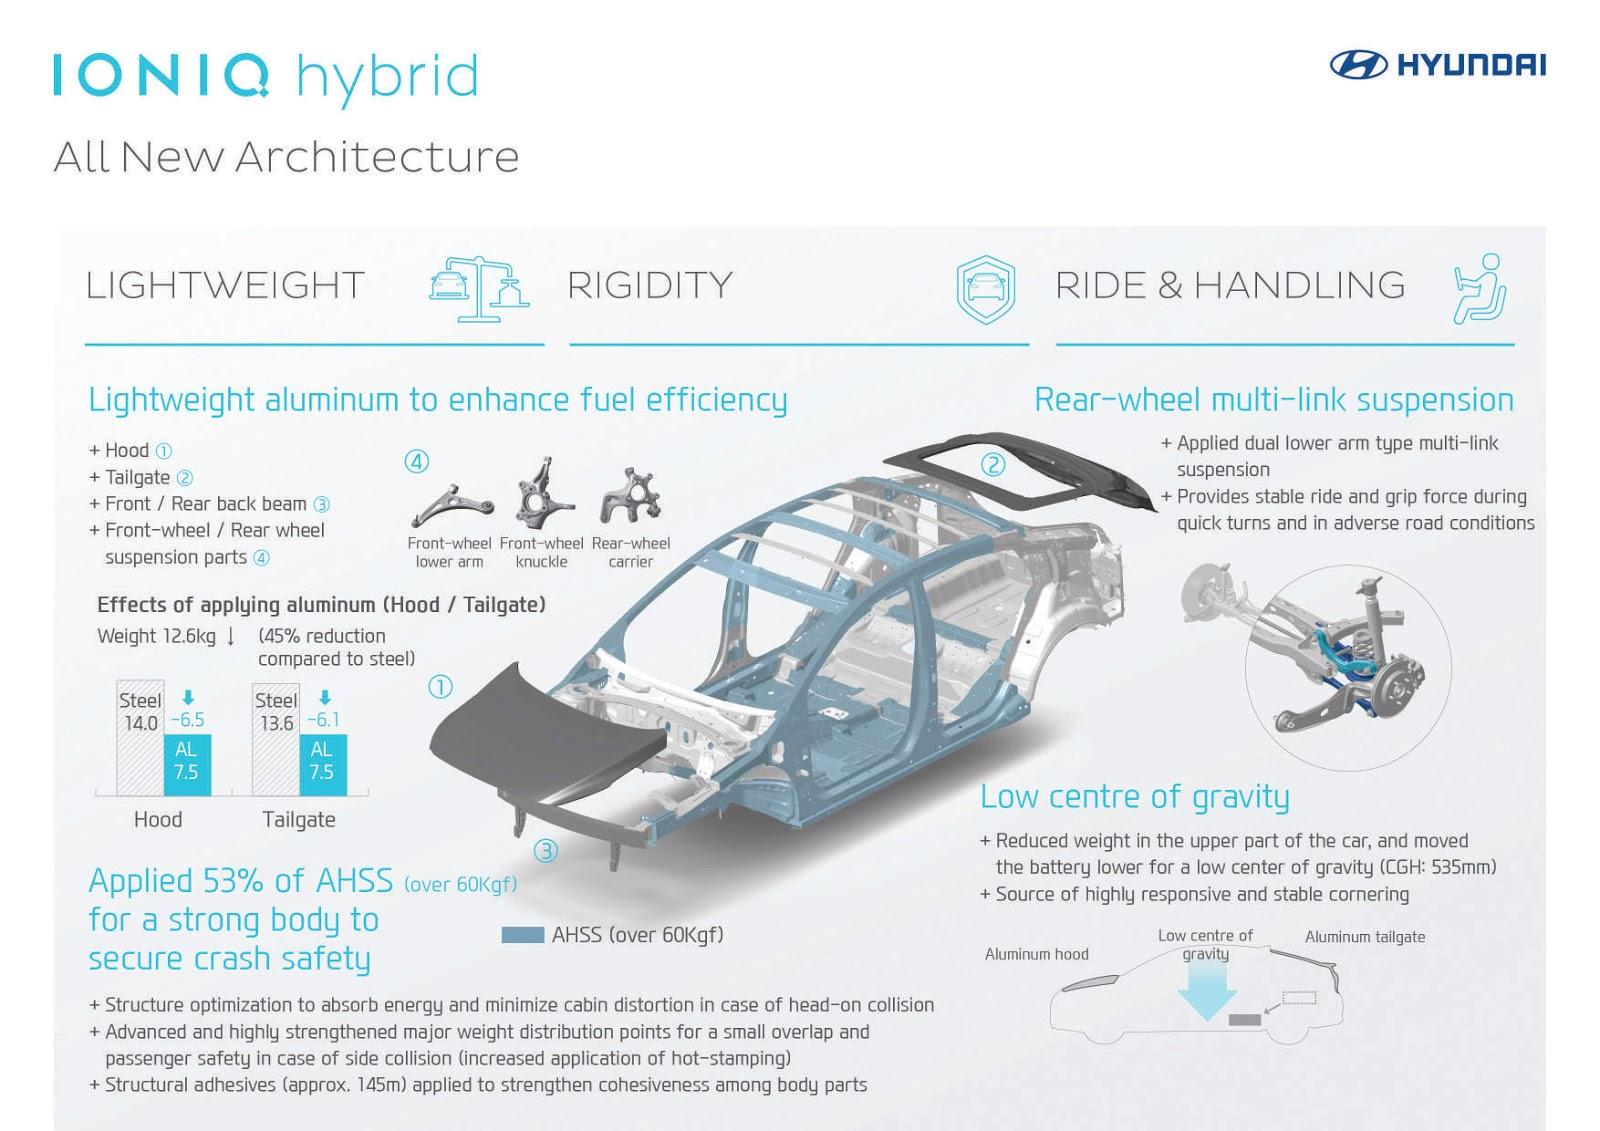 IONIQ%2Binfographic All%2BNew%2BArchitecture H Hyundai μας παρουσιάζει την προηγμένη υβριδική της τεχνολογία